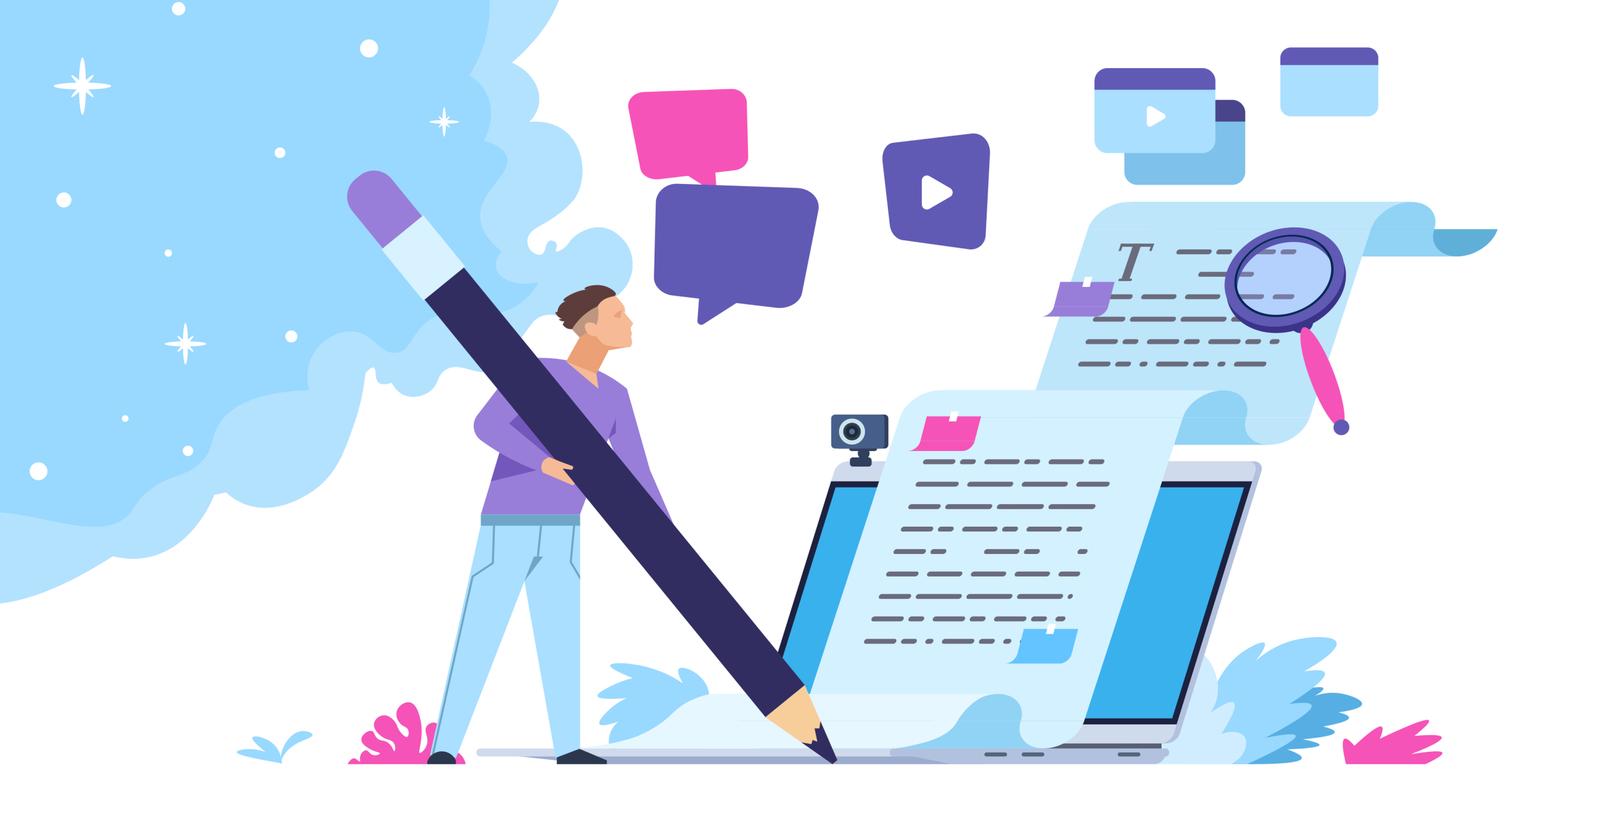 digital-marketing-blogs-guest-posts-6115307b5c3c6-sej.jpg